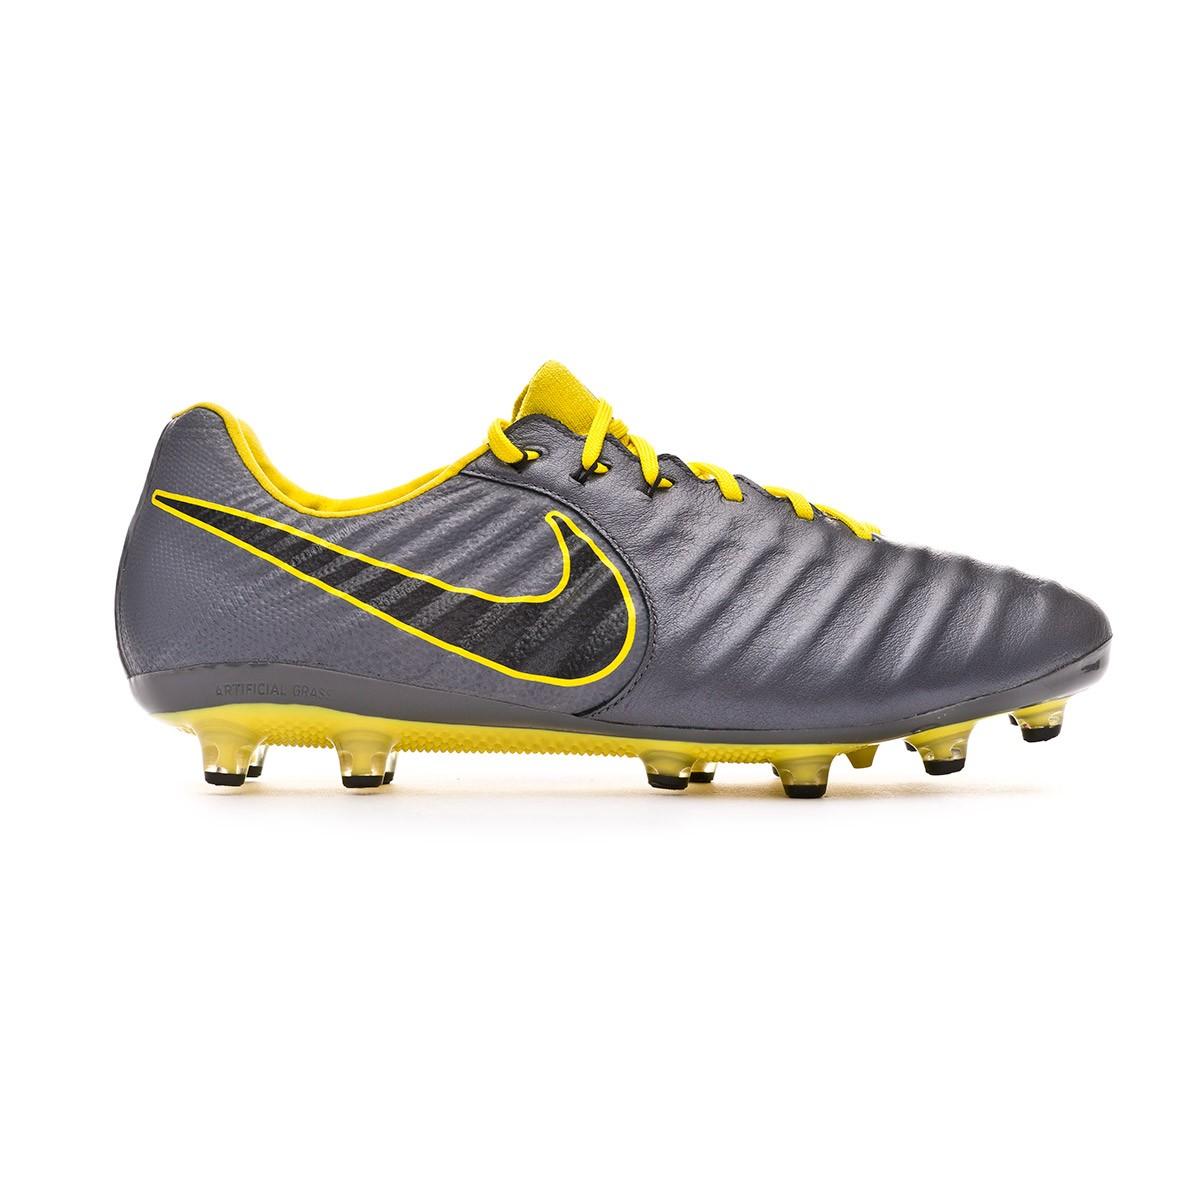 93fac367e88 Football Boots Nike Tiempo Legend VII Elite AG-Pro Dark grey-Black-Optical  yellow - Football store Fútbol Emotion